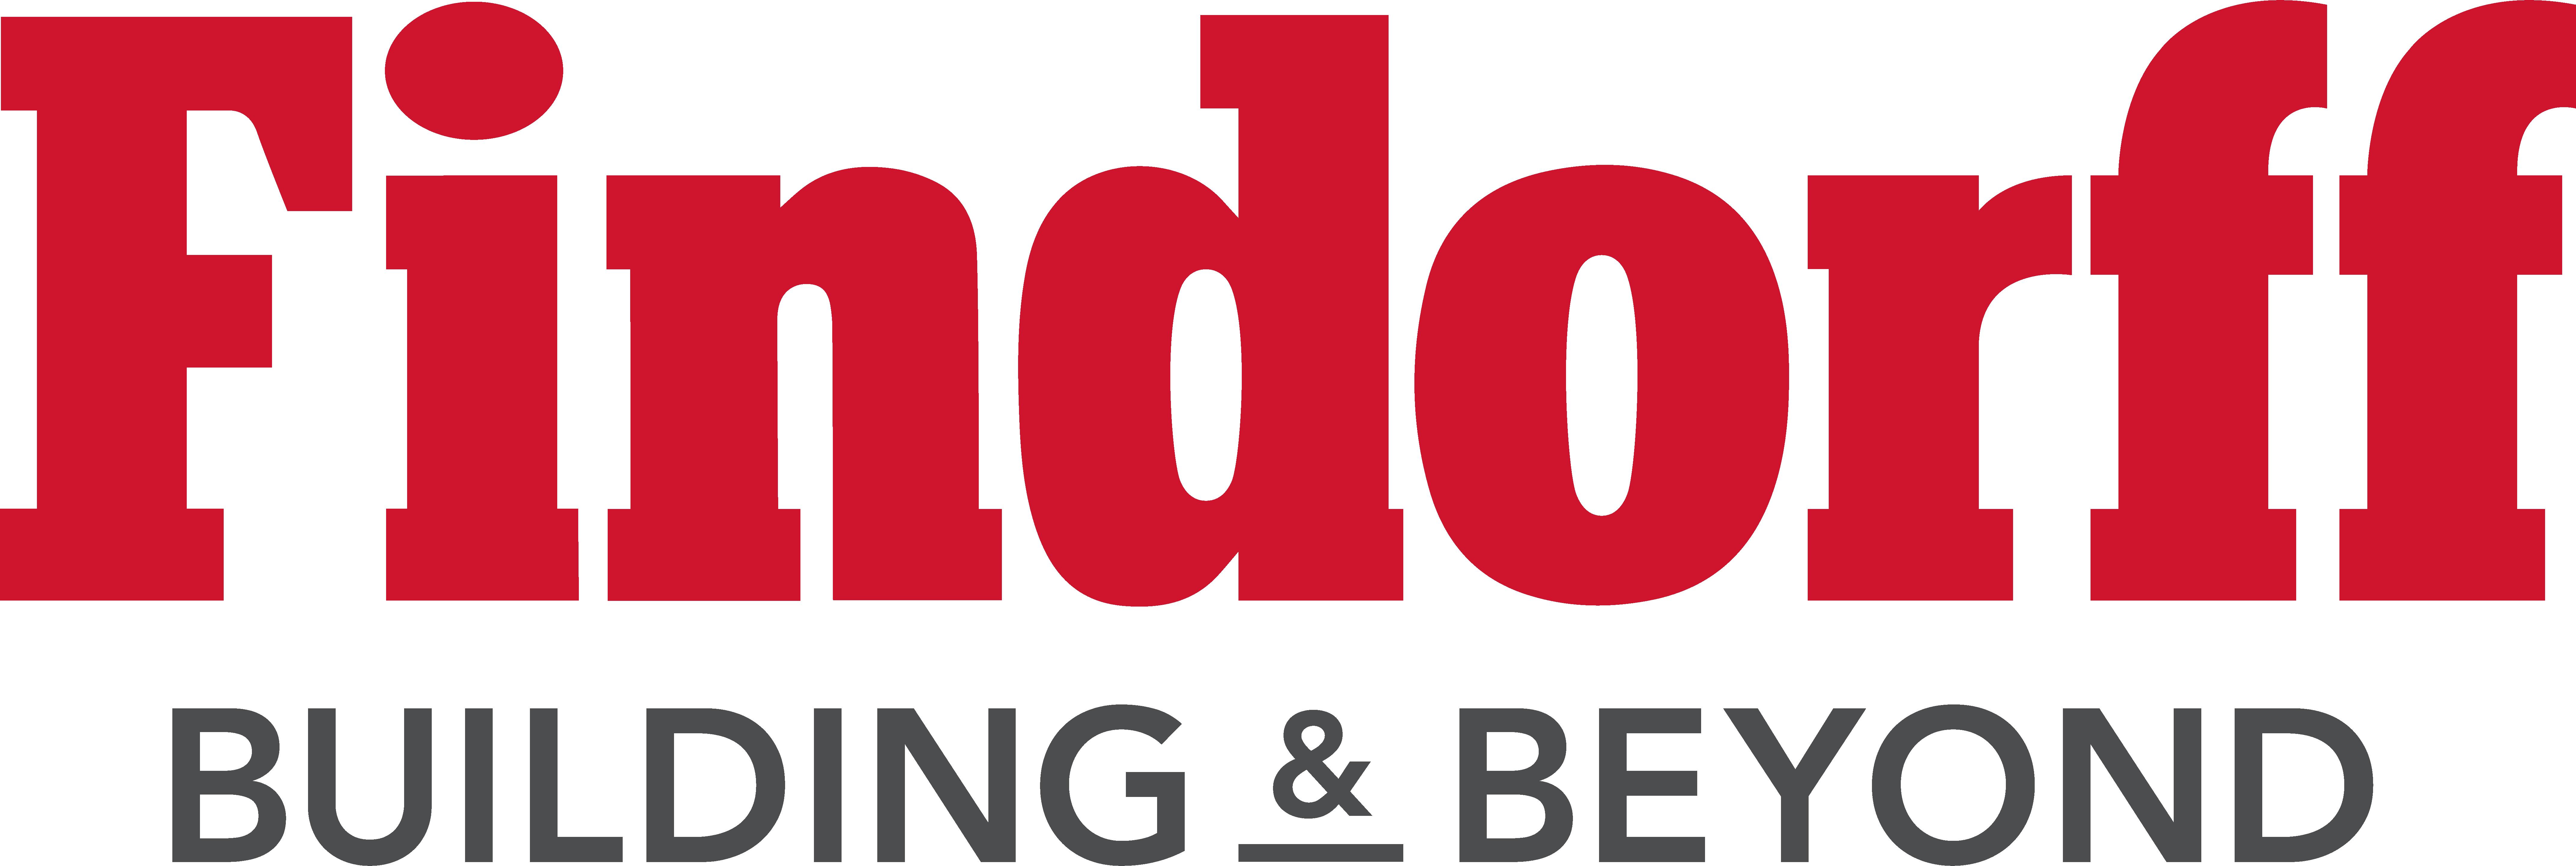 J.H. Findorff & Son, Inc.